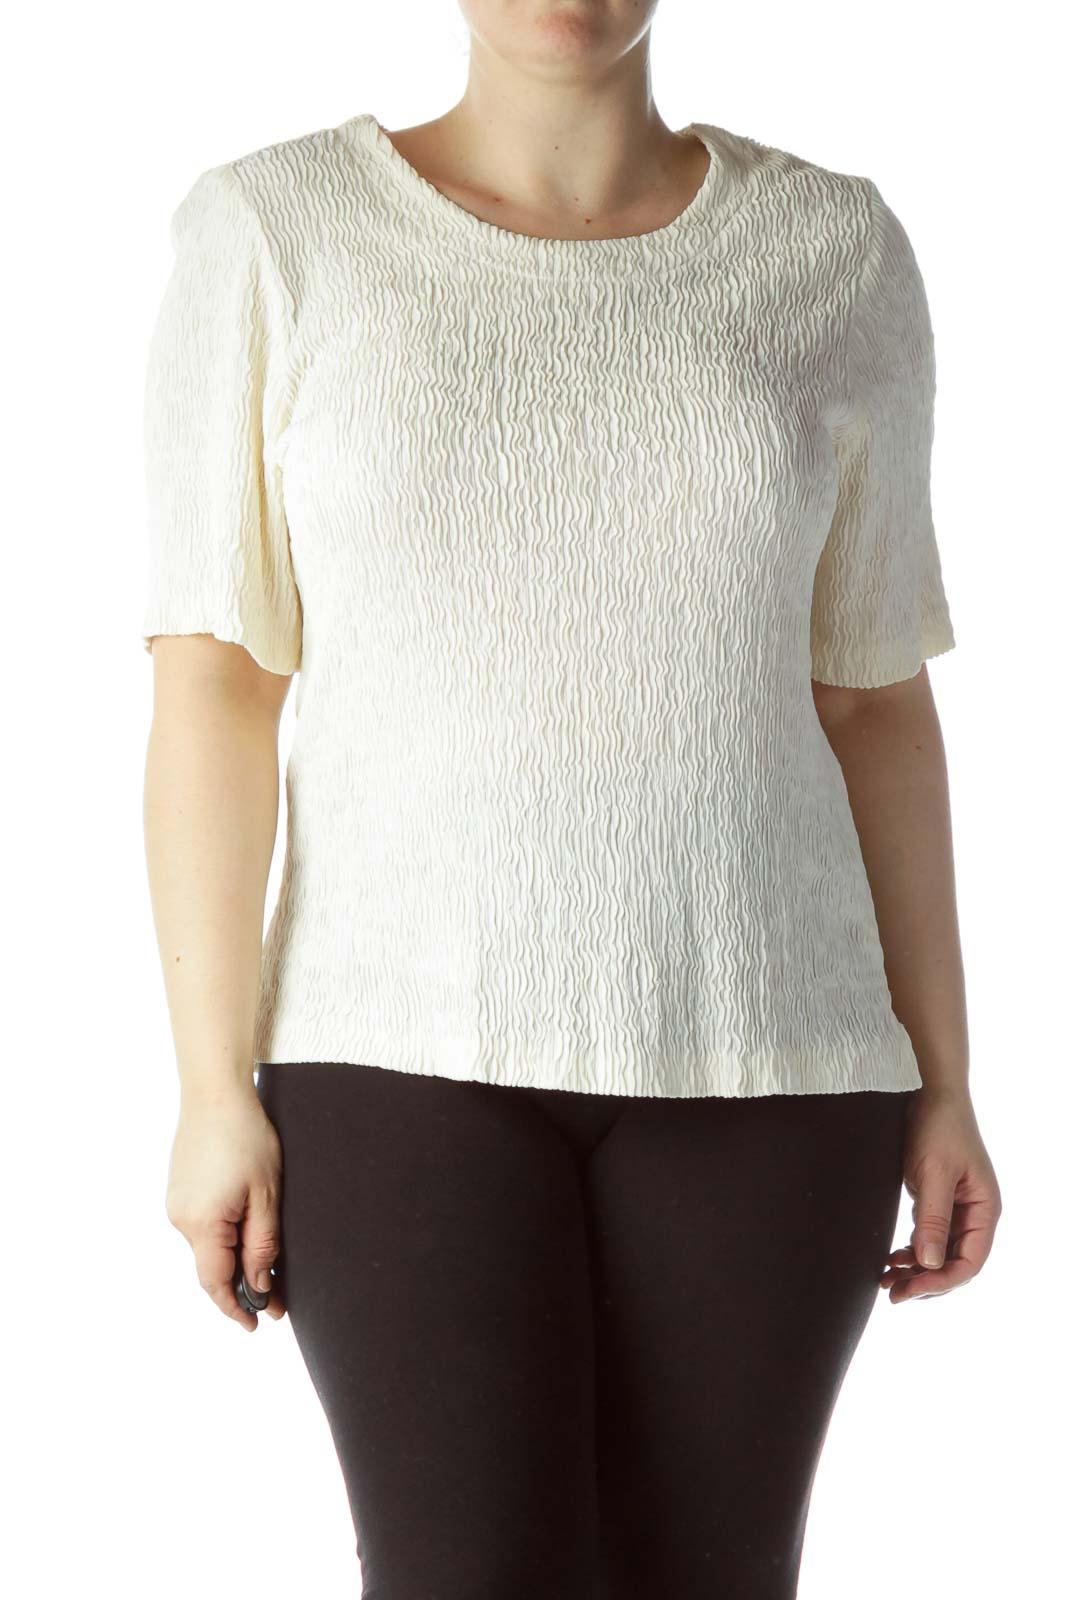 Cream Textured Knit Stretch Top